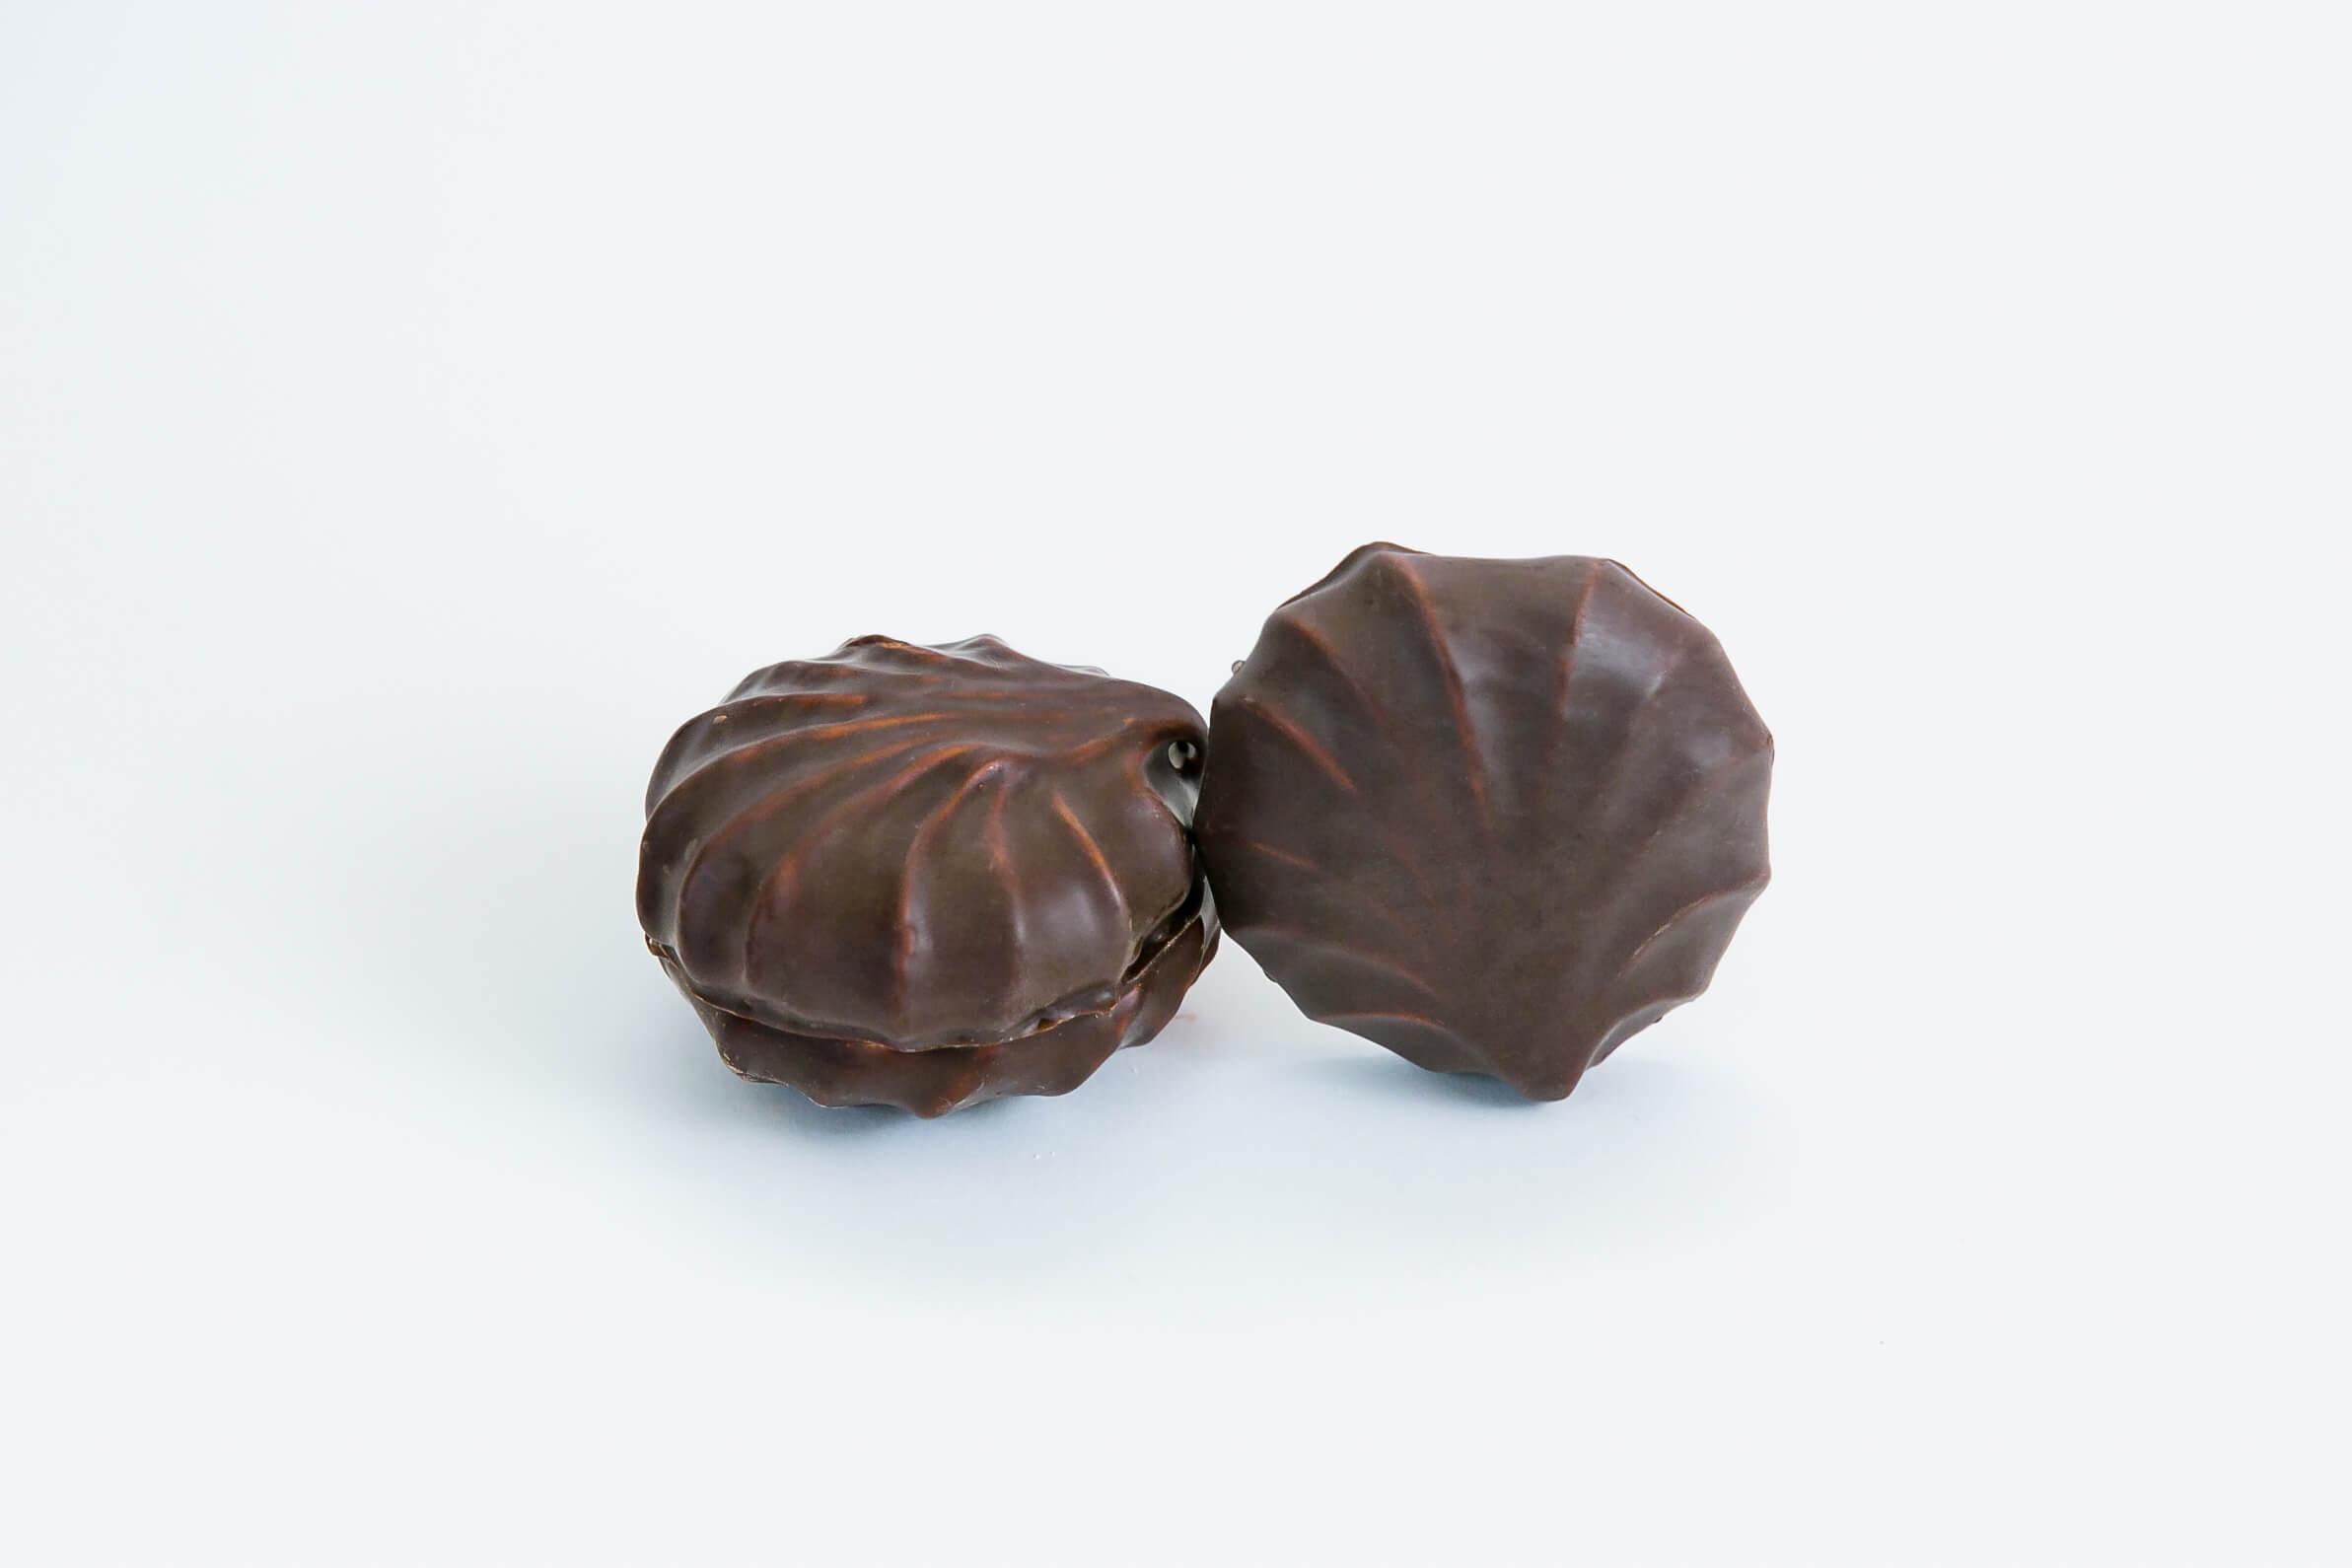 Зефир в шоколаде домашних условиях рецепт фото